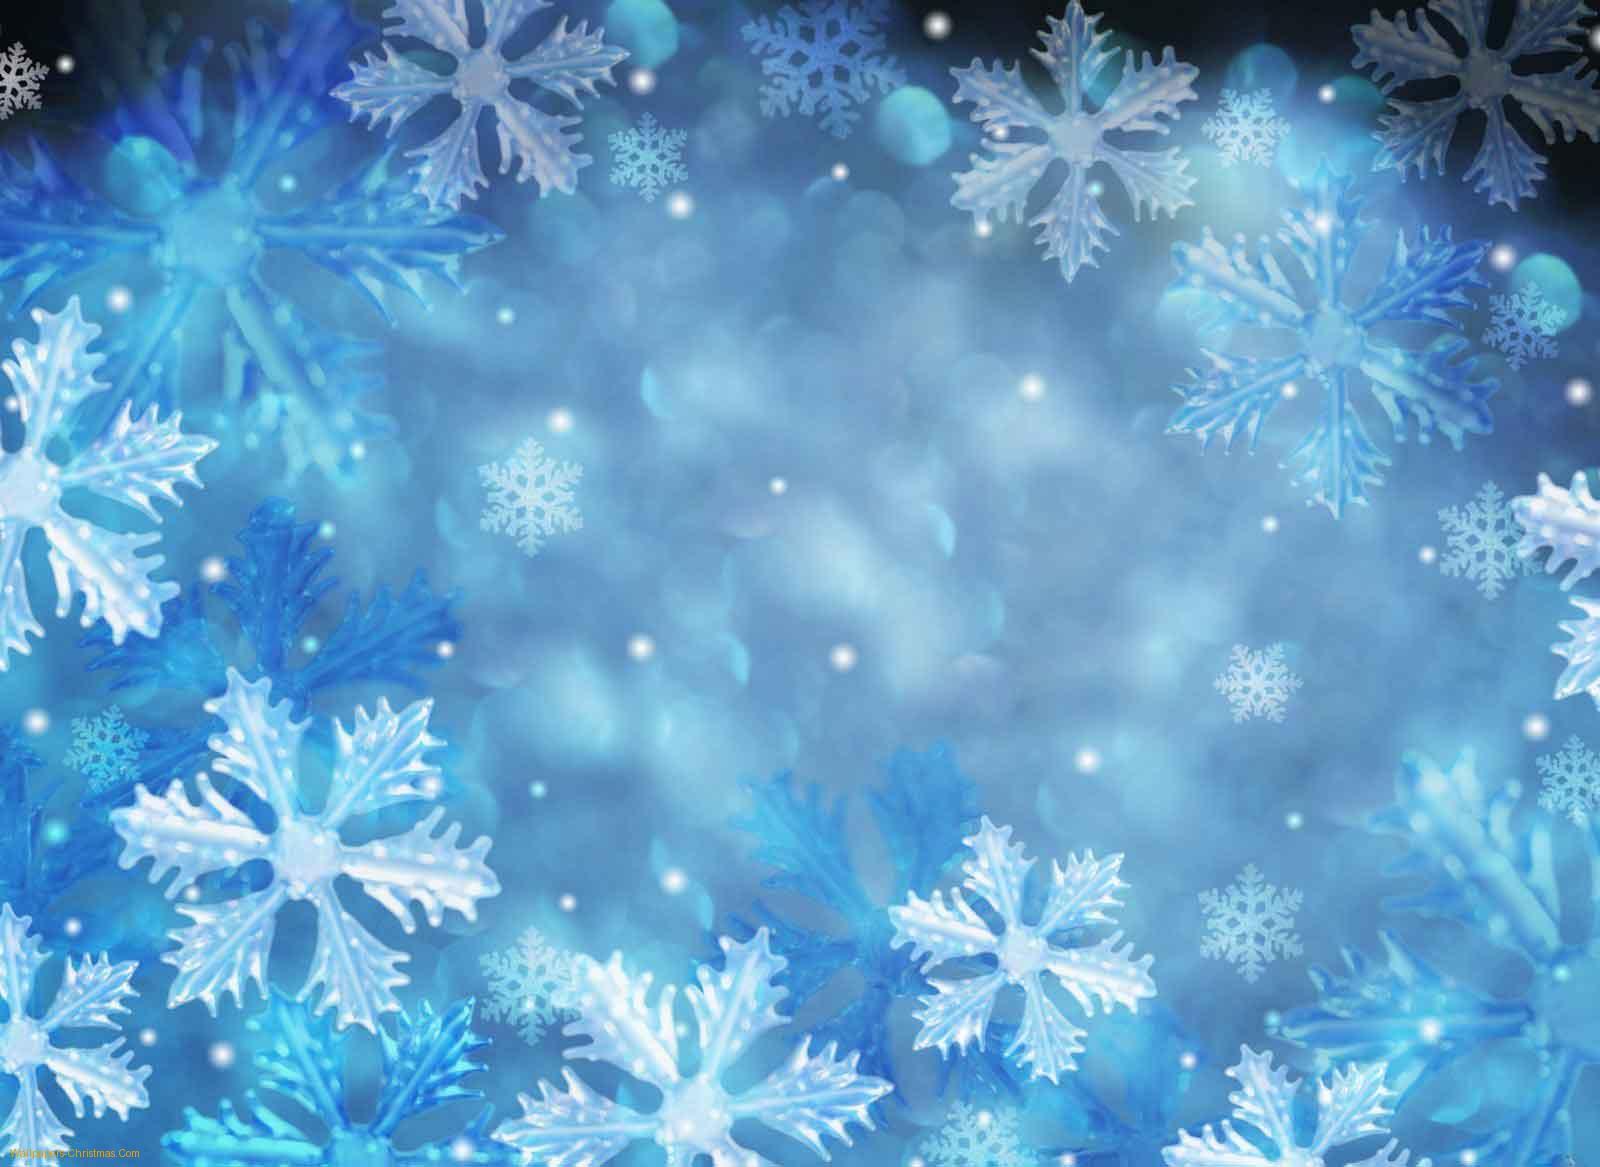 Snow background wallpaper - SF Wallpaper